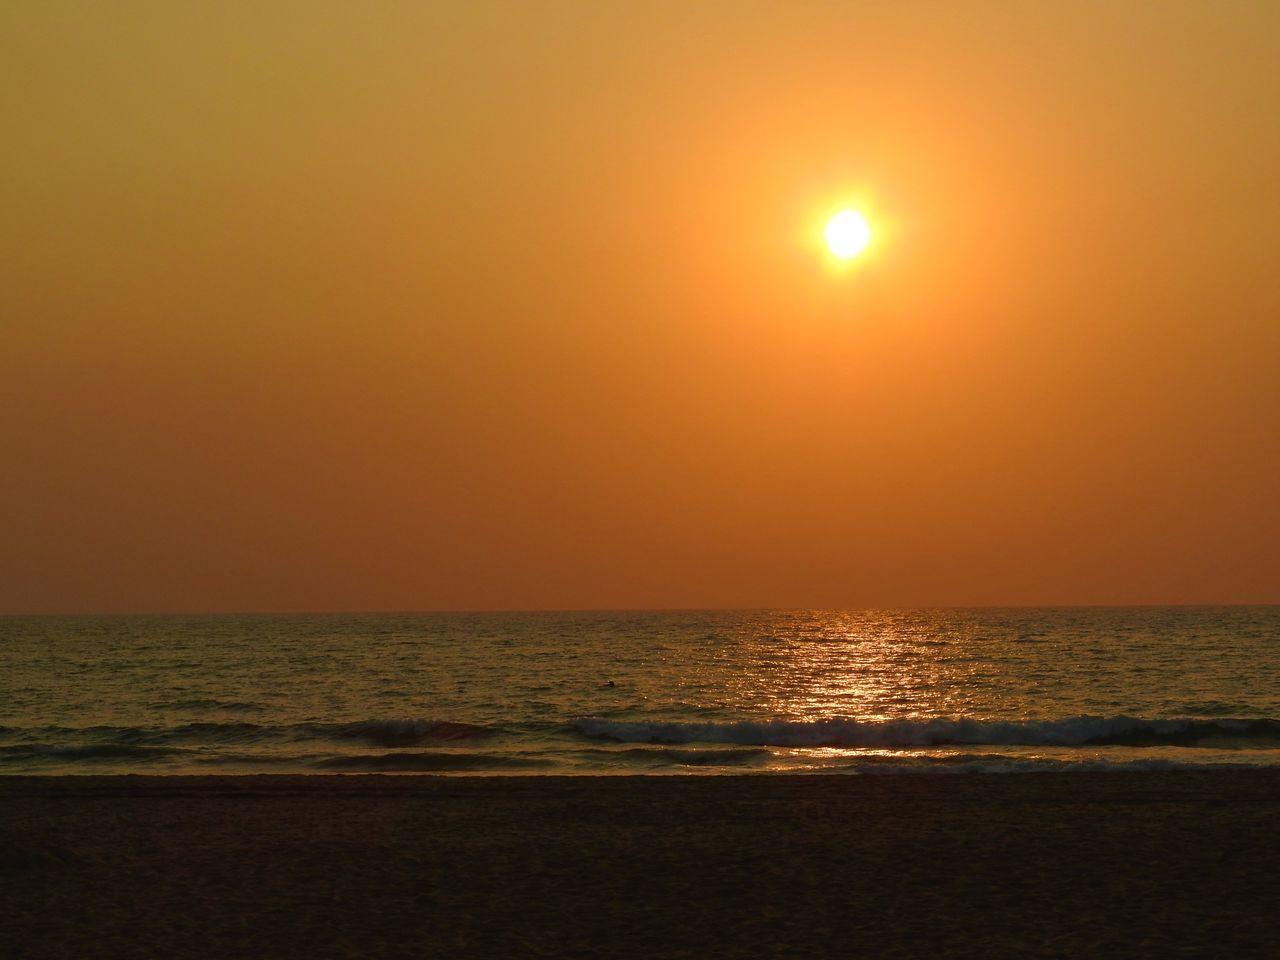 Beach Sun Beach Sun ☀ Eyeem Beach Sunset Beach Sunset Sea Sky Horizon Over Water Sea Sunset Sunset #sun #clouds #skylovers #sky #nature #beautifulinnature #naturalbeauty #photography #landscape Sunset_collection Water Yellow Sunset